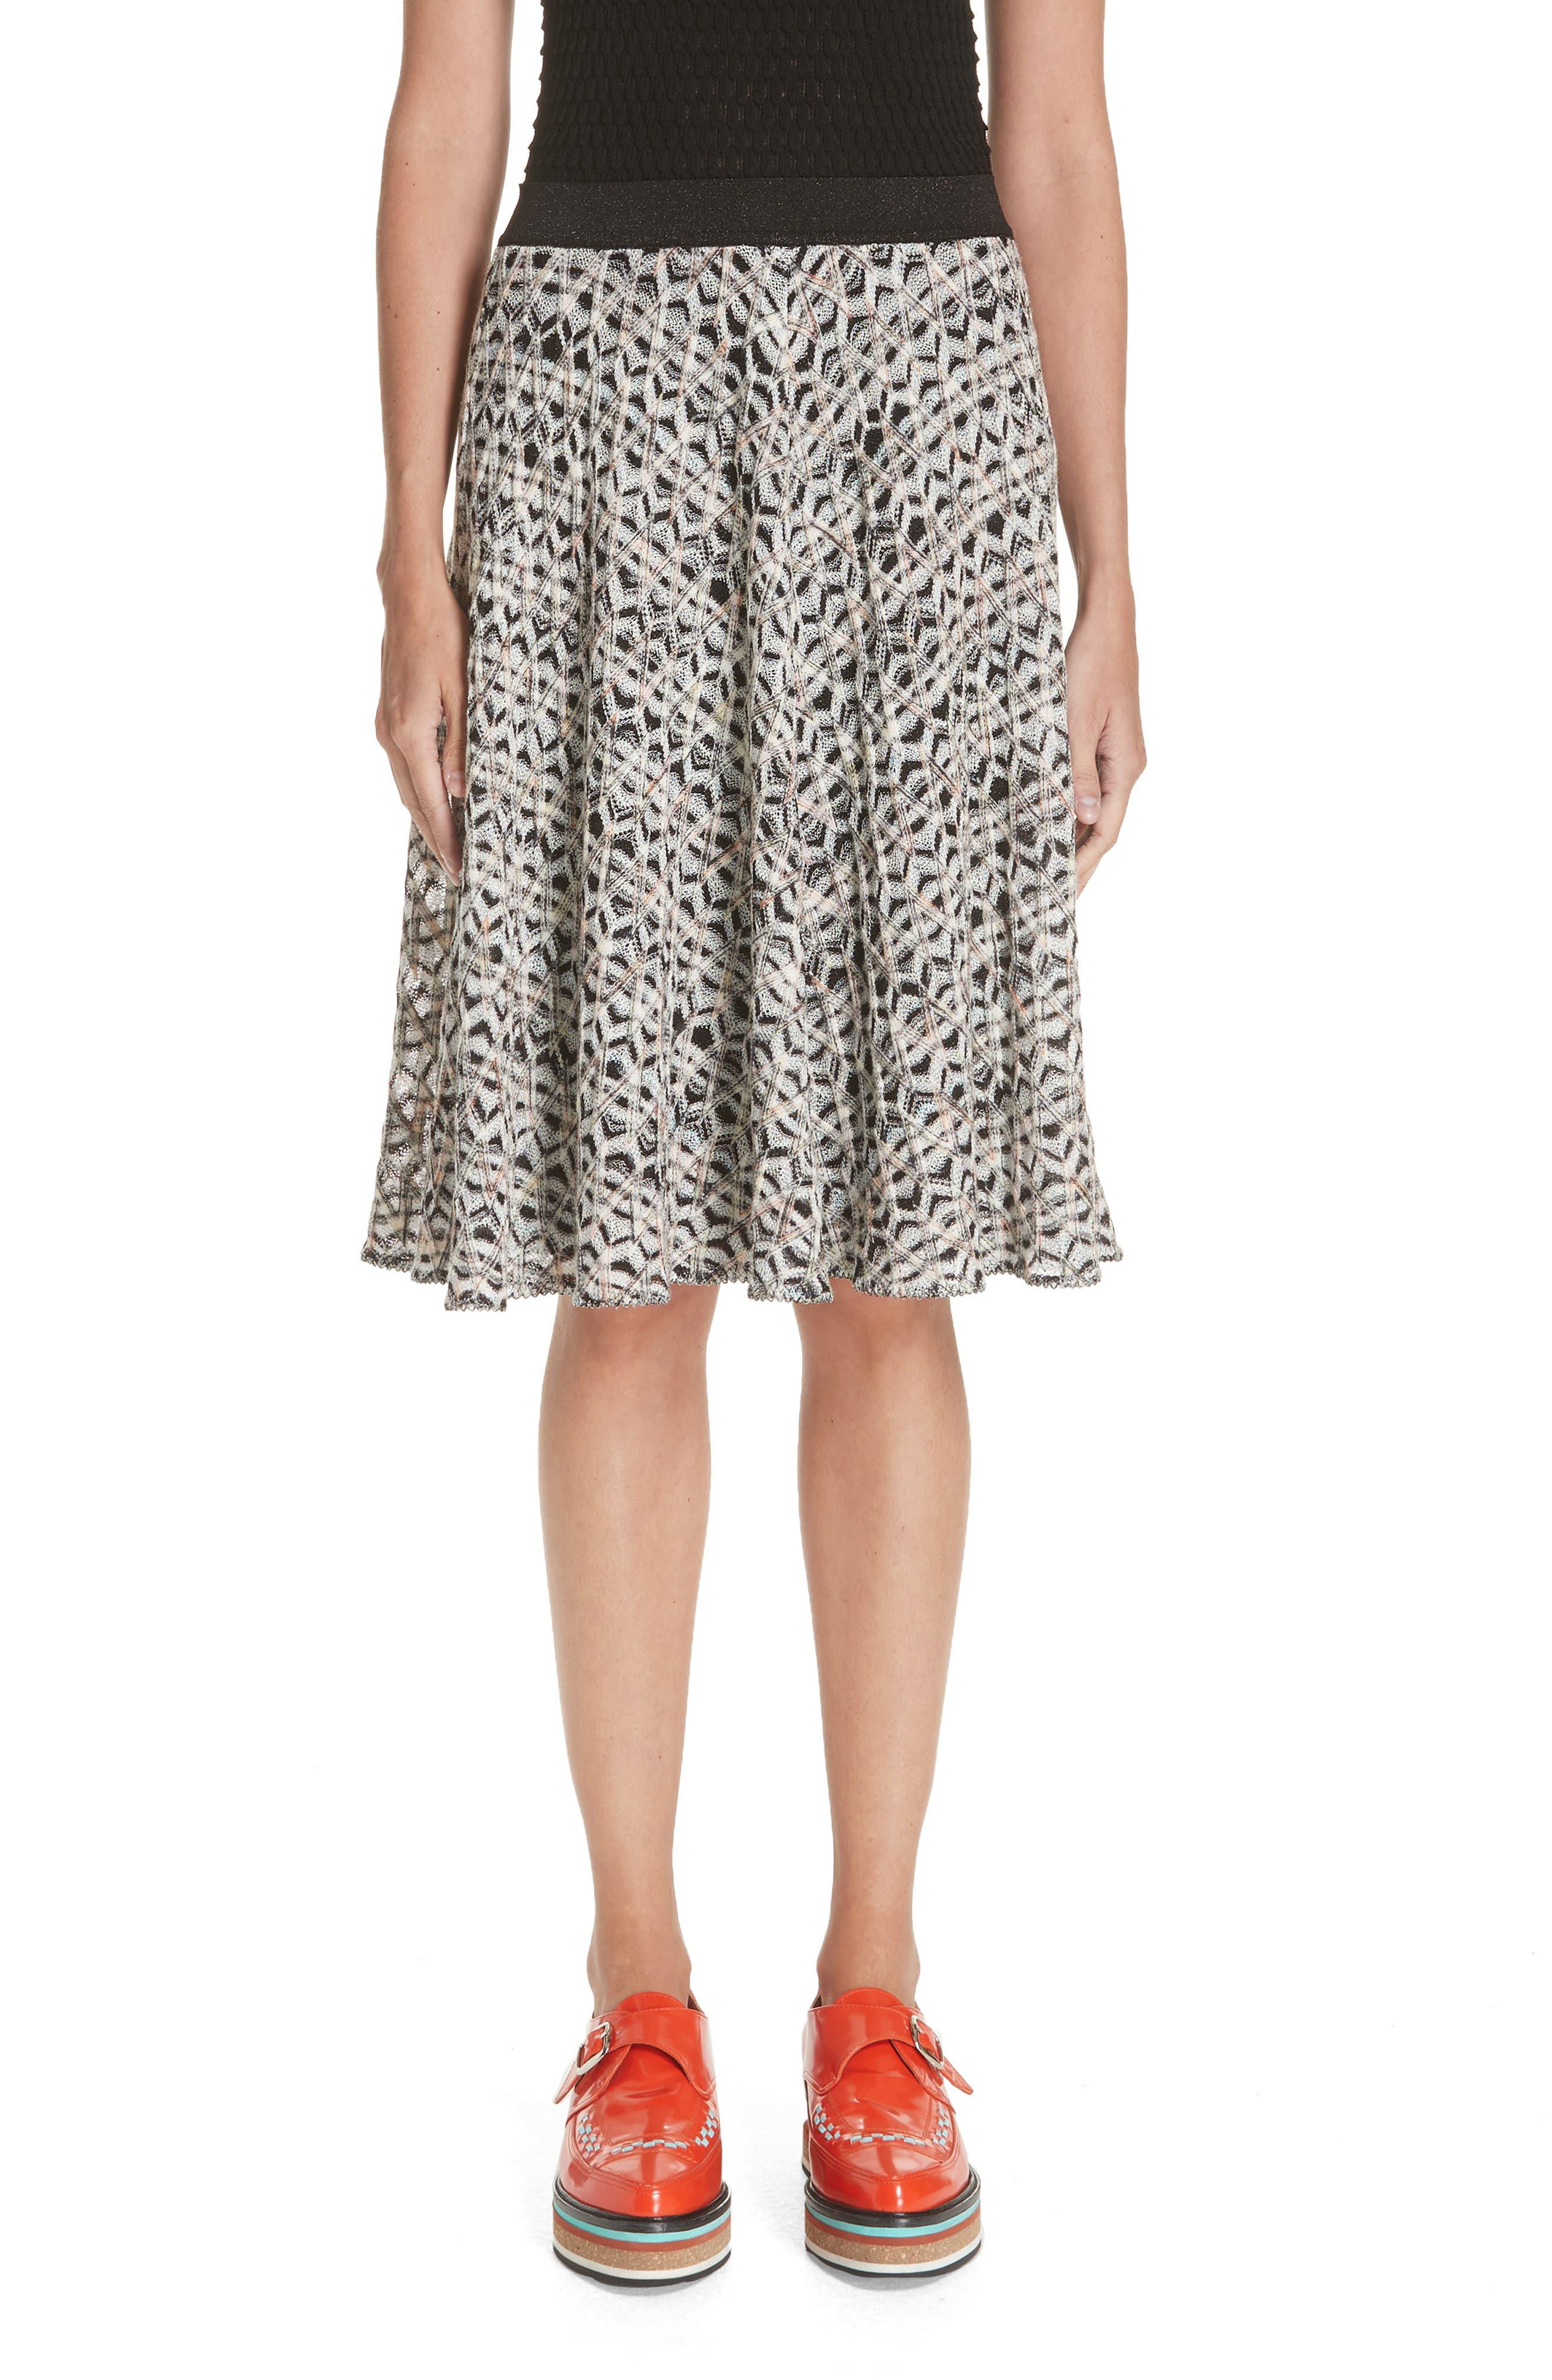 MISSONI Zig Zag A-Line Skirt, Main, color, MULTI